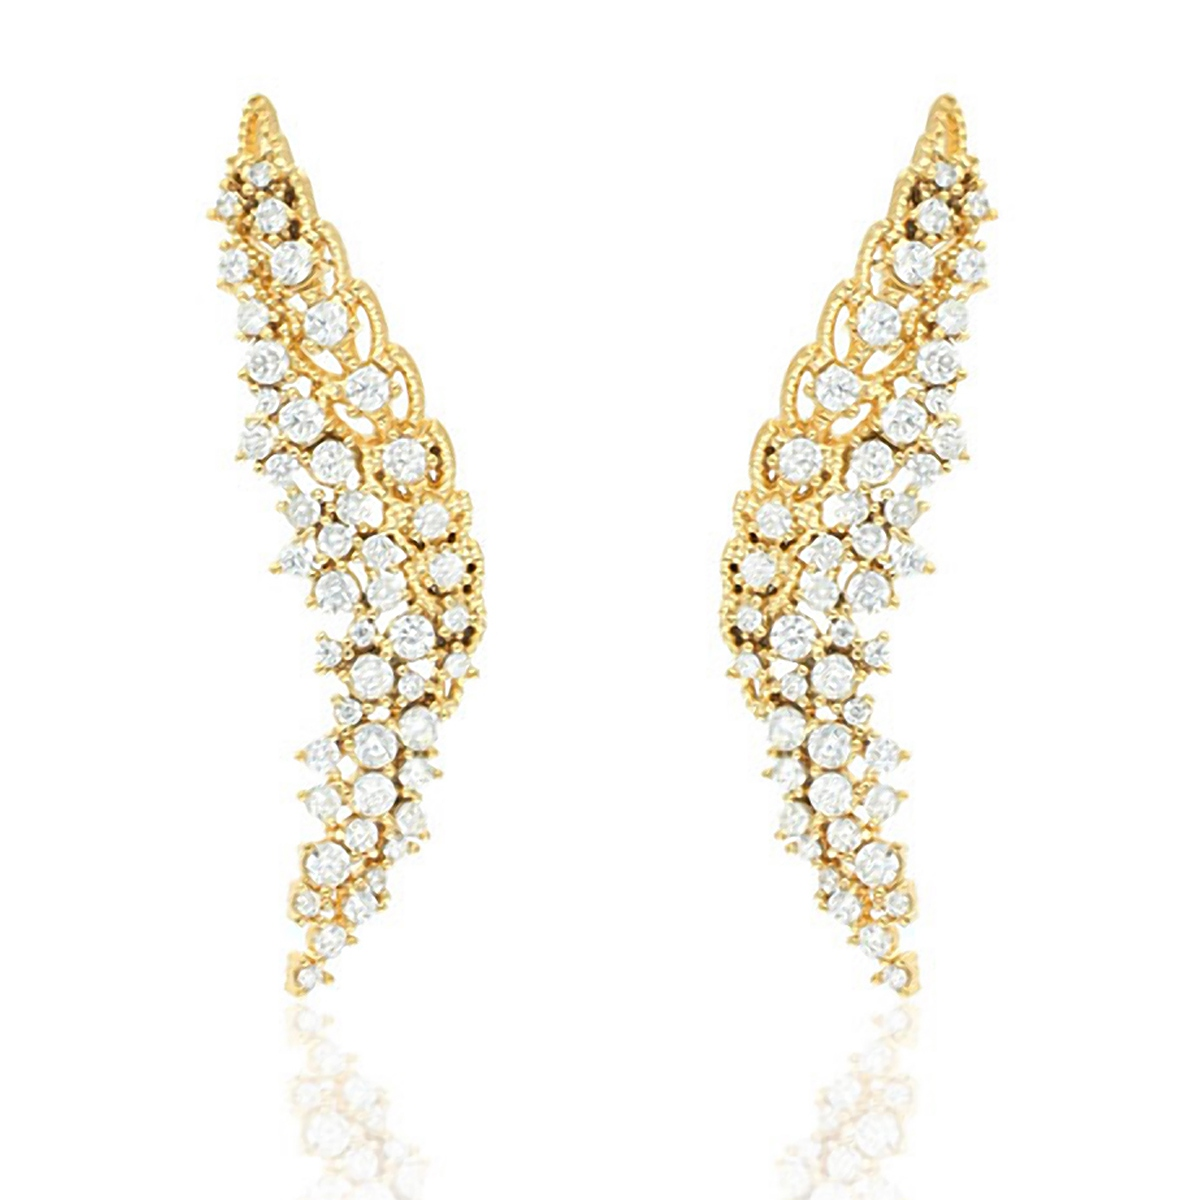 Ear Cuff Asa Luxo Semijoia em Ouro 18K com Zircônia Branca - SOLOYOU ... 2f79ff52cf